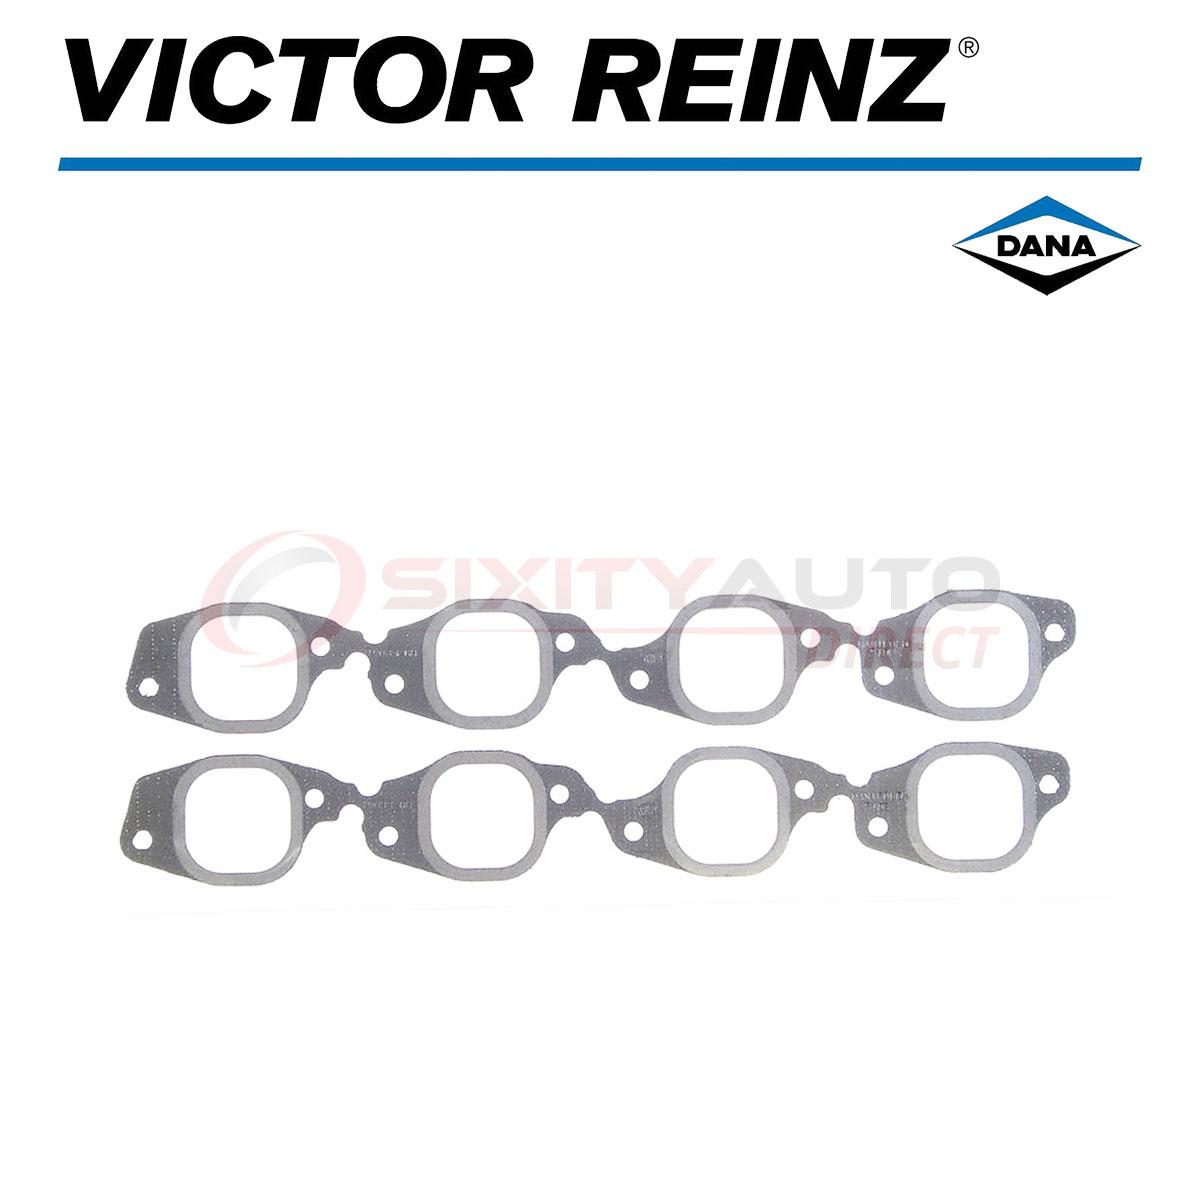 Victor Reinz Exhaust Manifold Gasket Set For